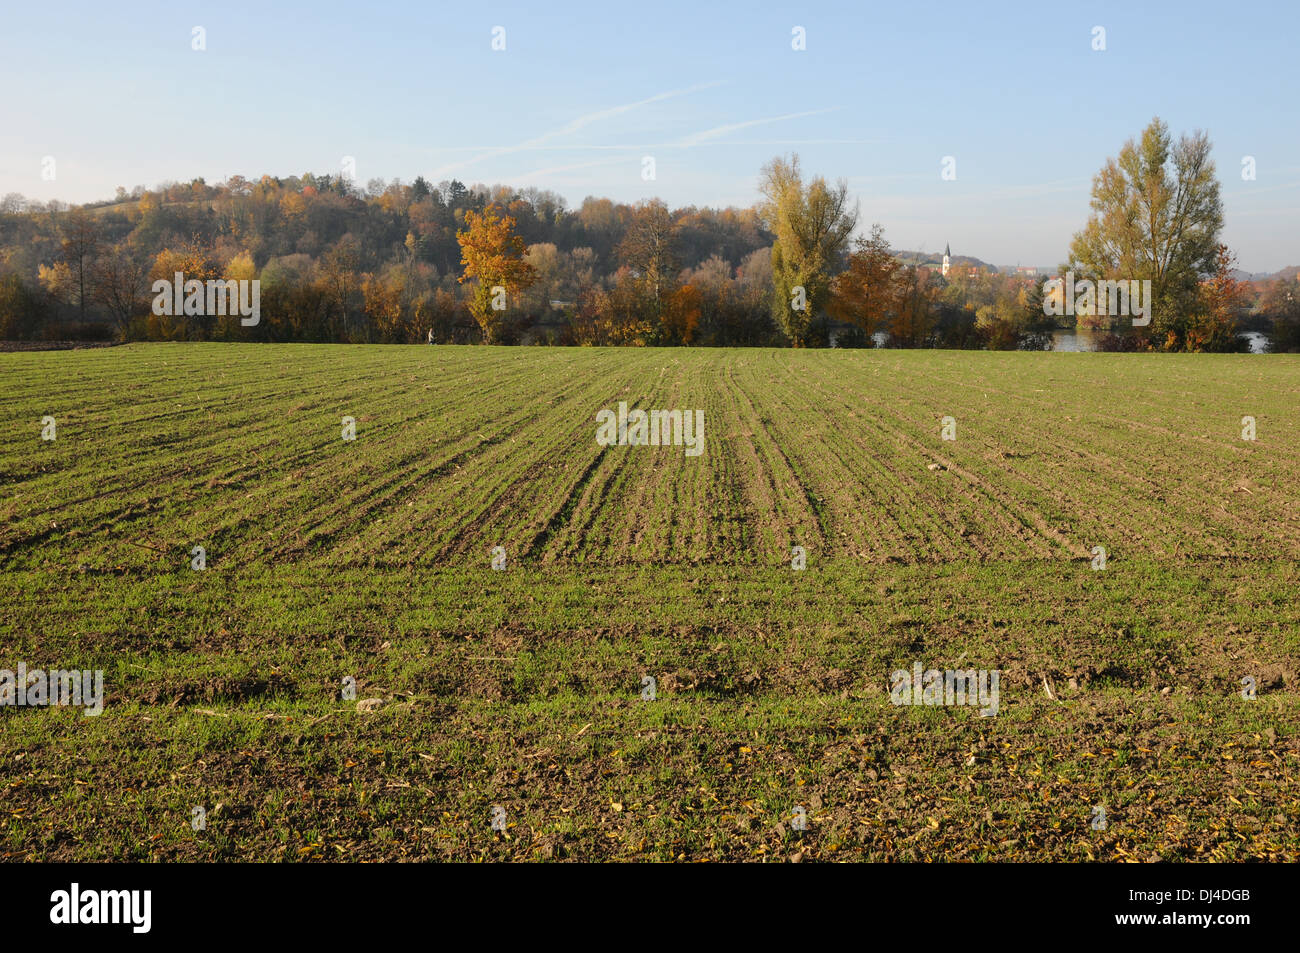 Wheat-Field - Stock Image